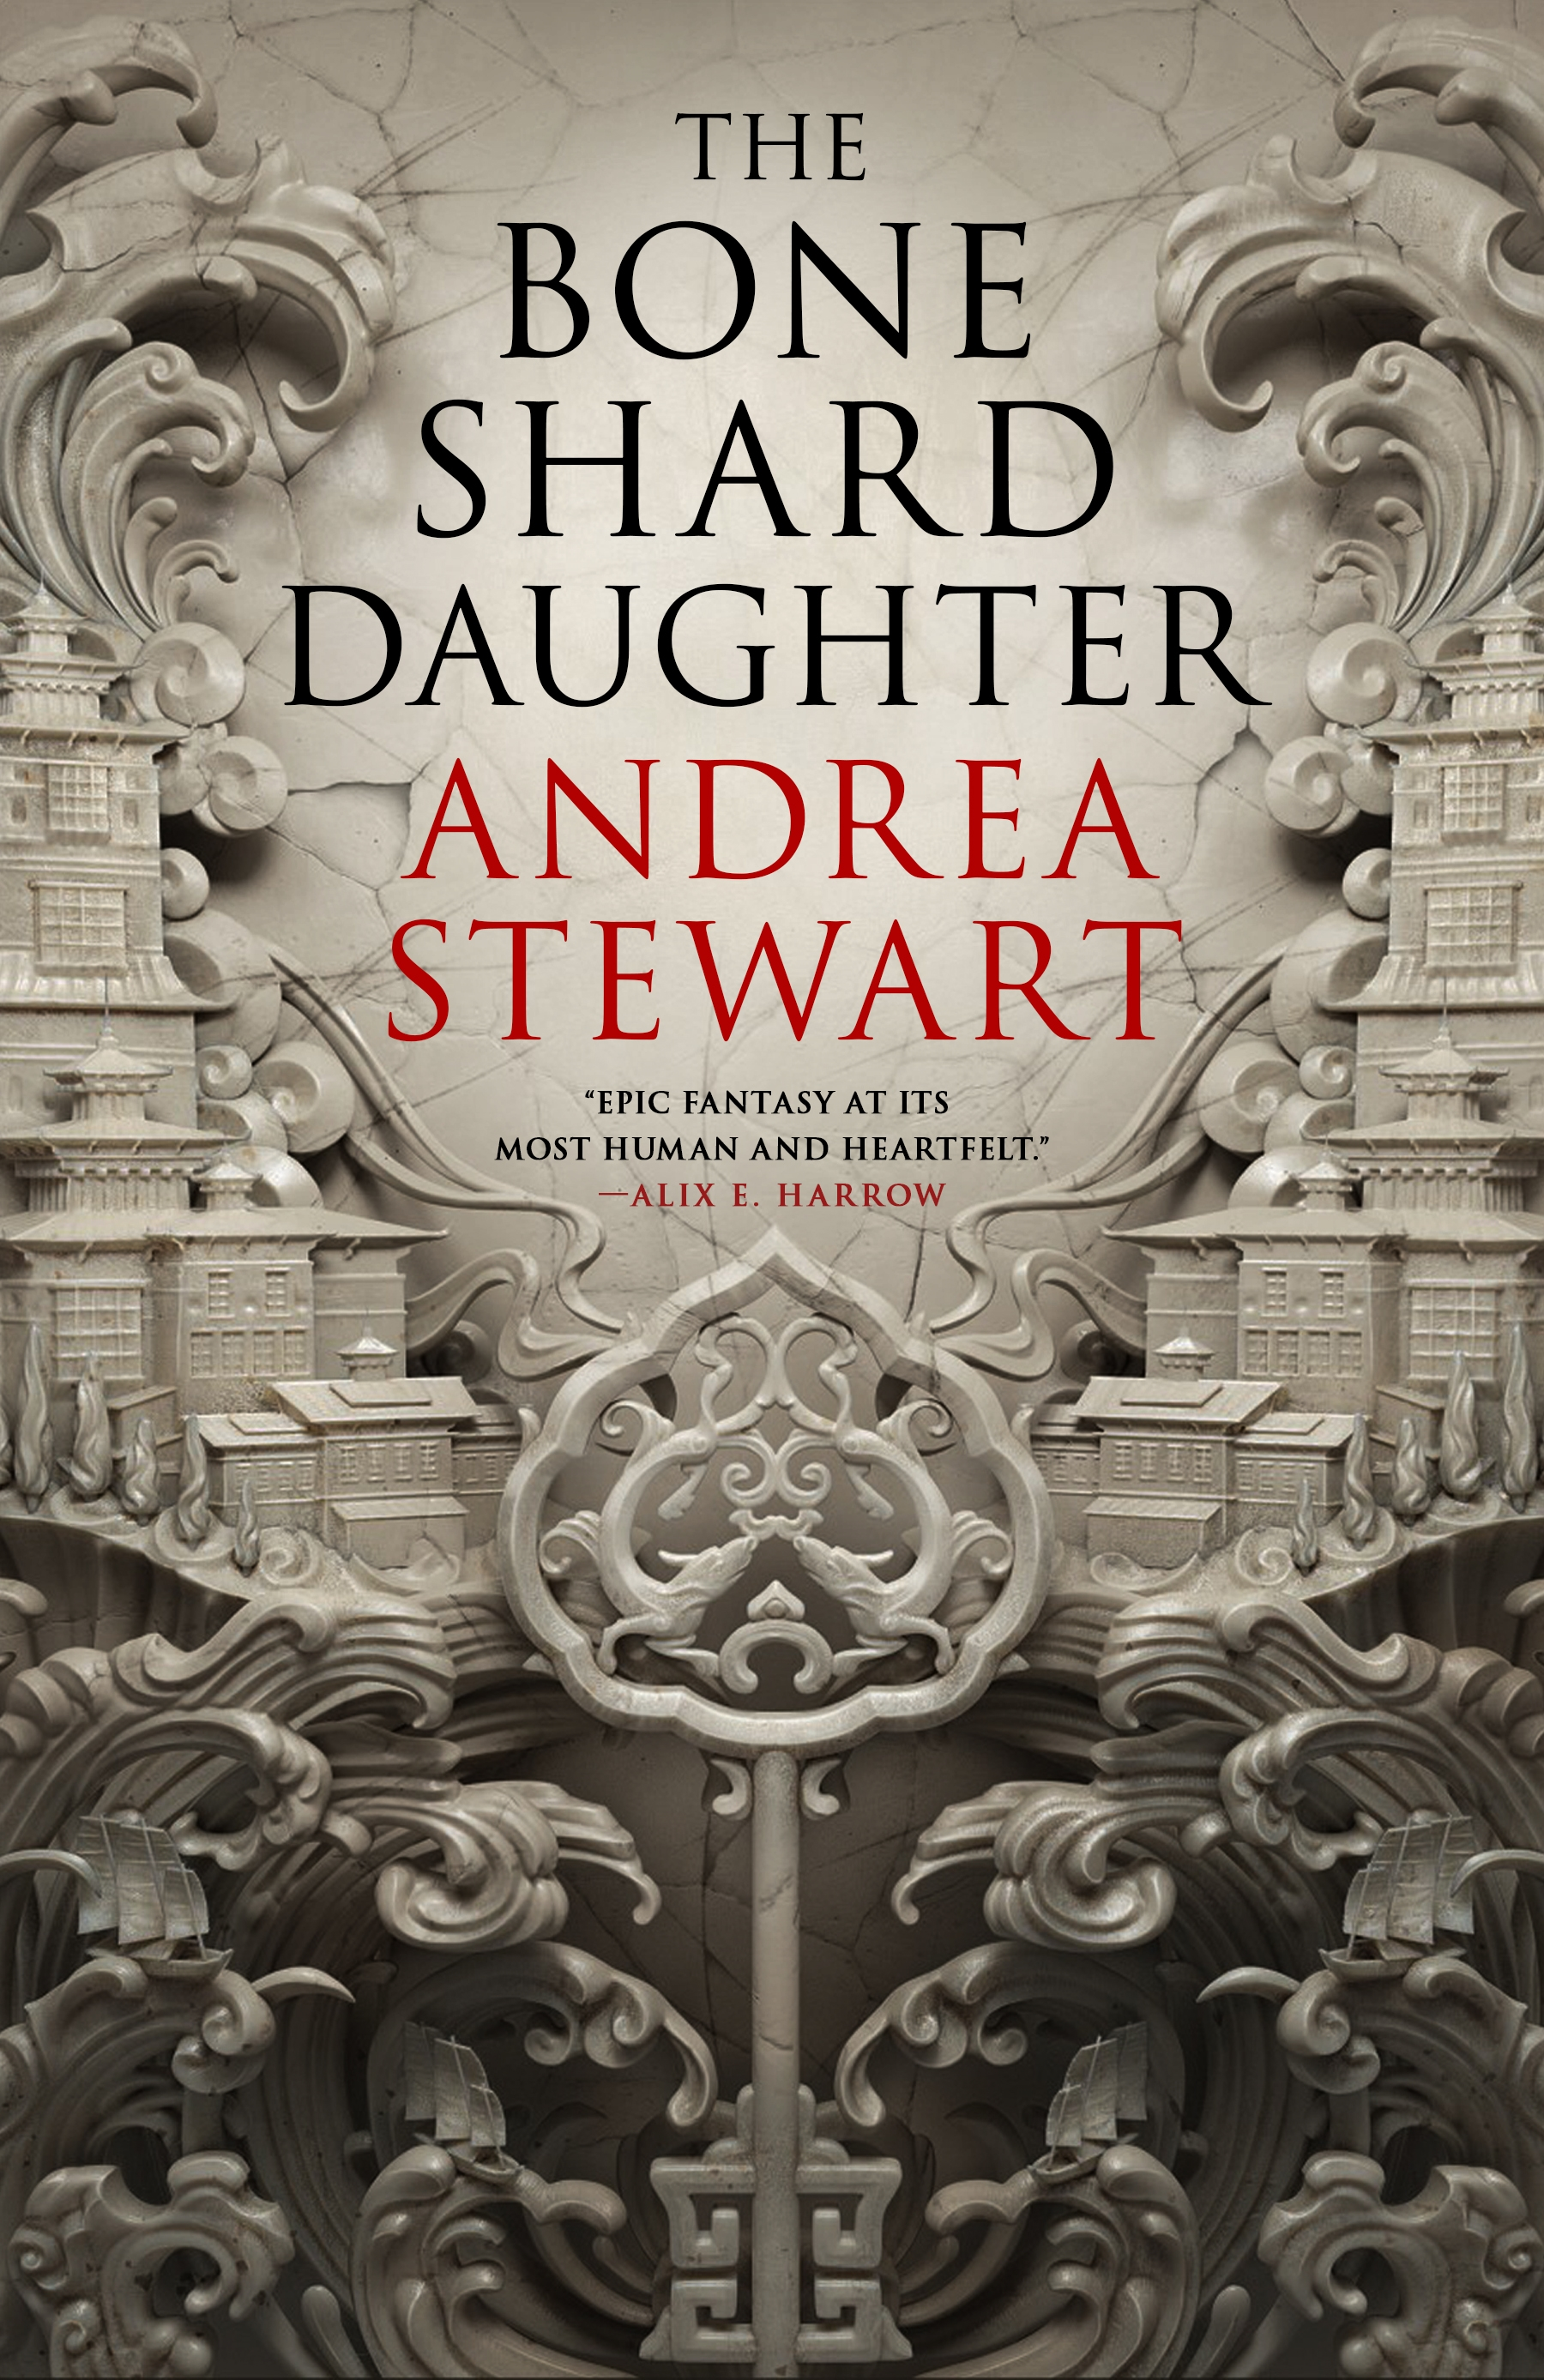 The Bone Shard Daughter by Andrea Stewart | Hachette UK